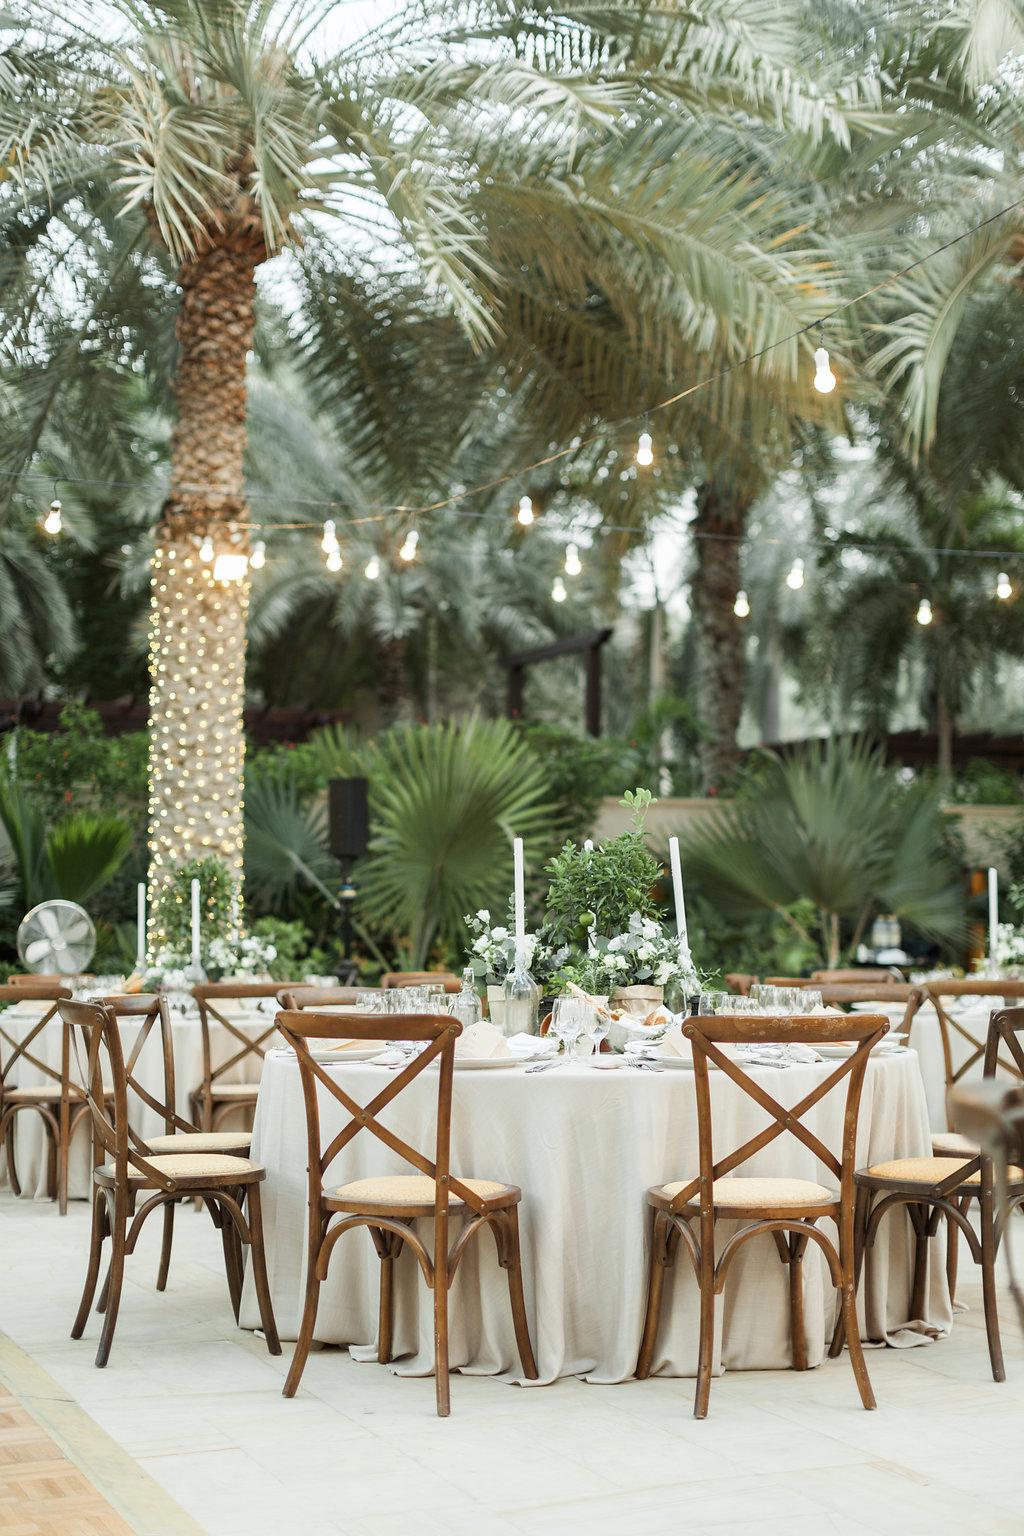 Maria_Sundin_Photography_Wedding_Dubai_Magnolia_Al_Qasr_Gemma_Ryan-398